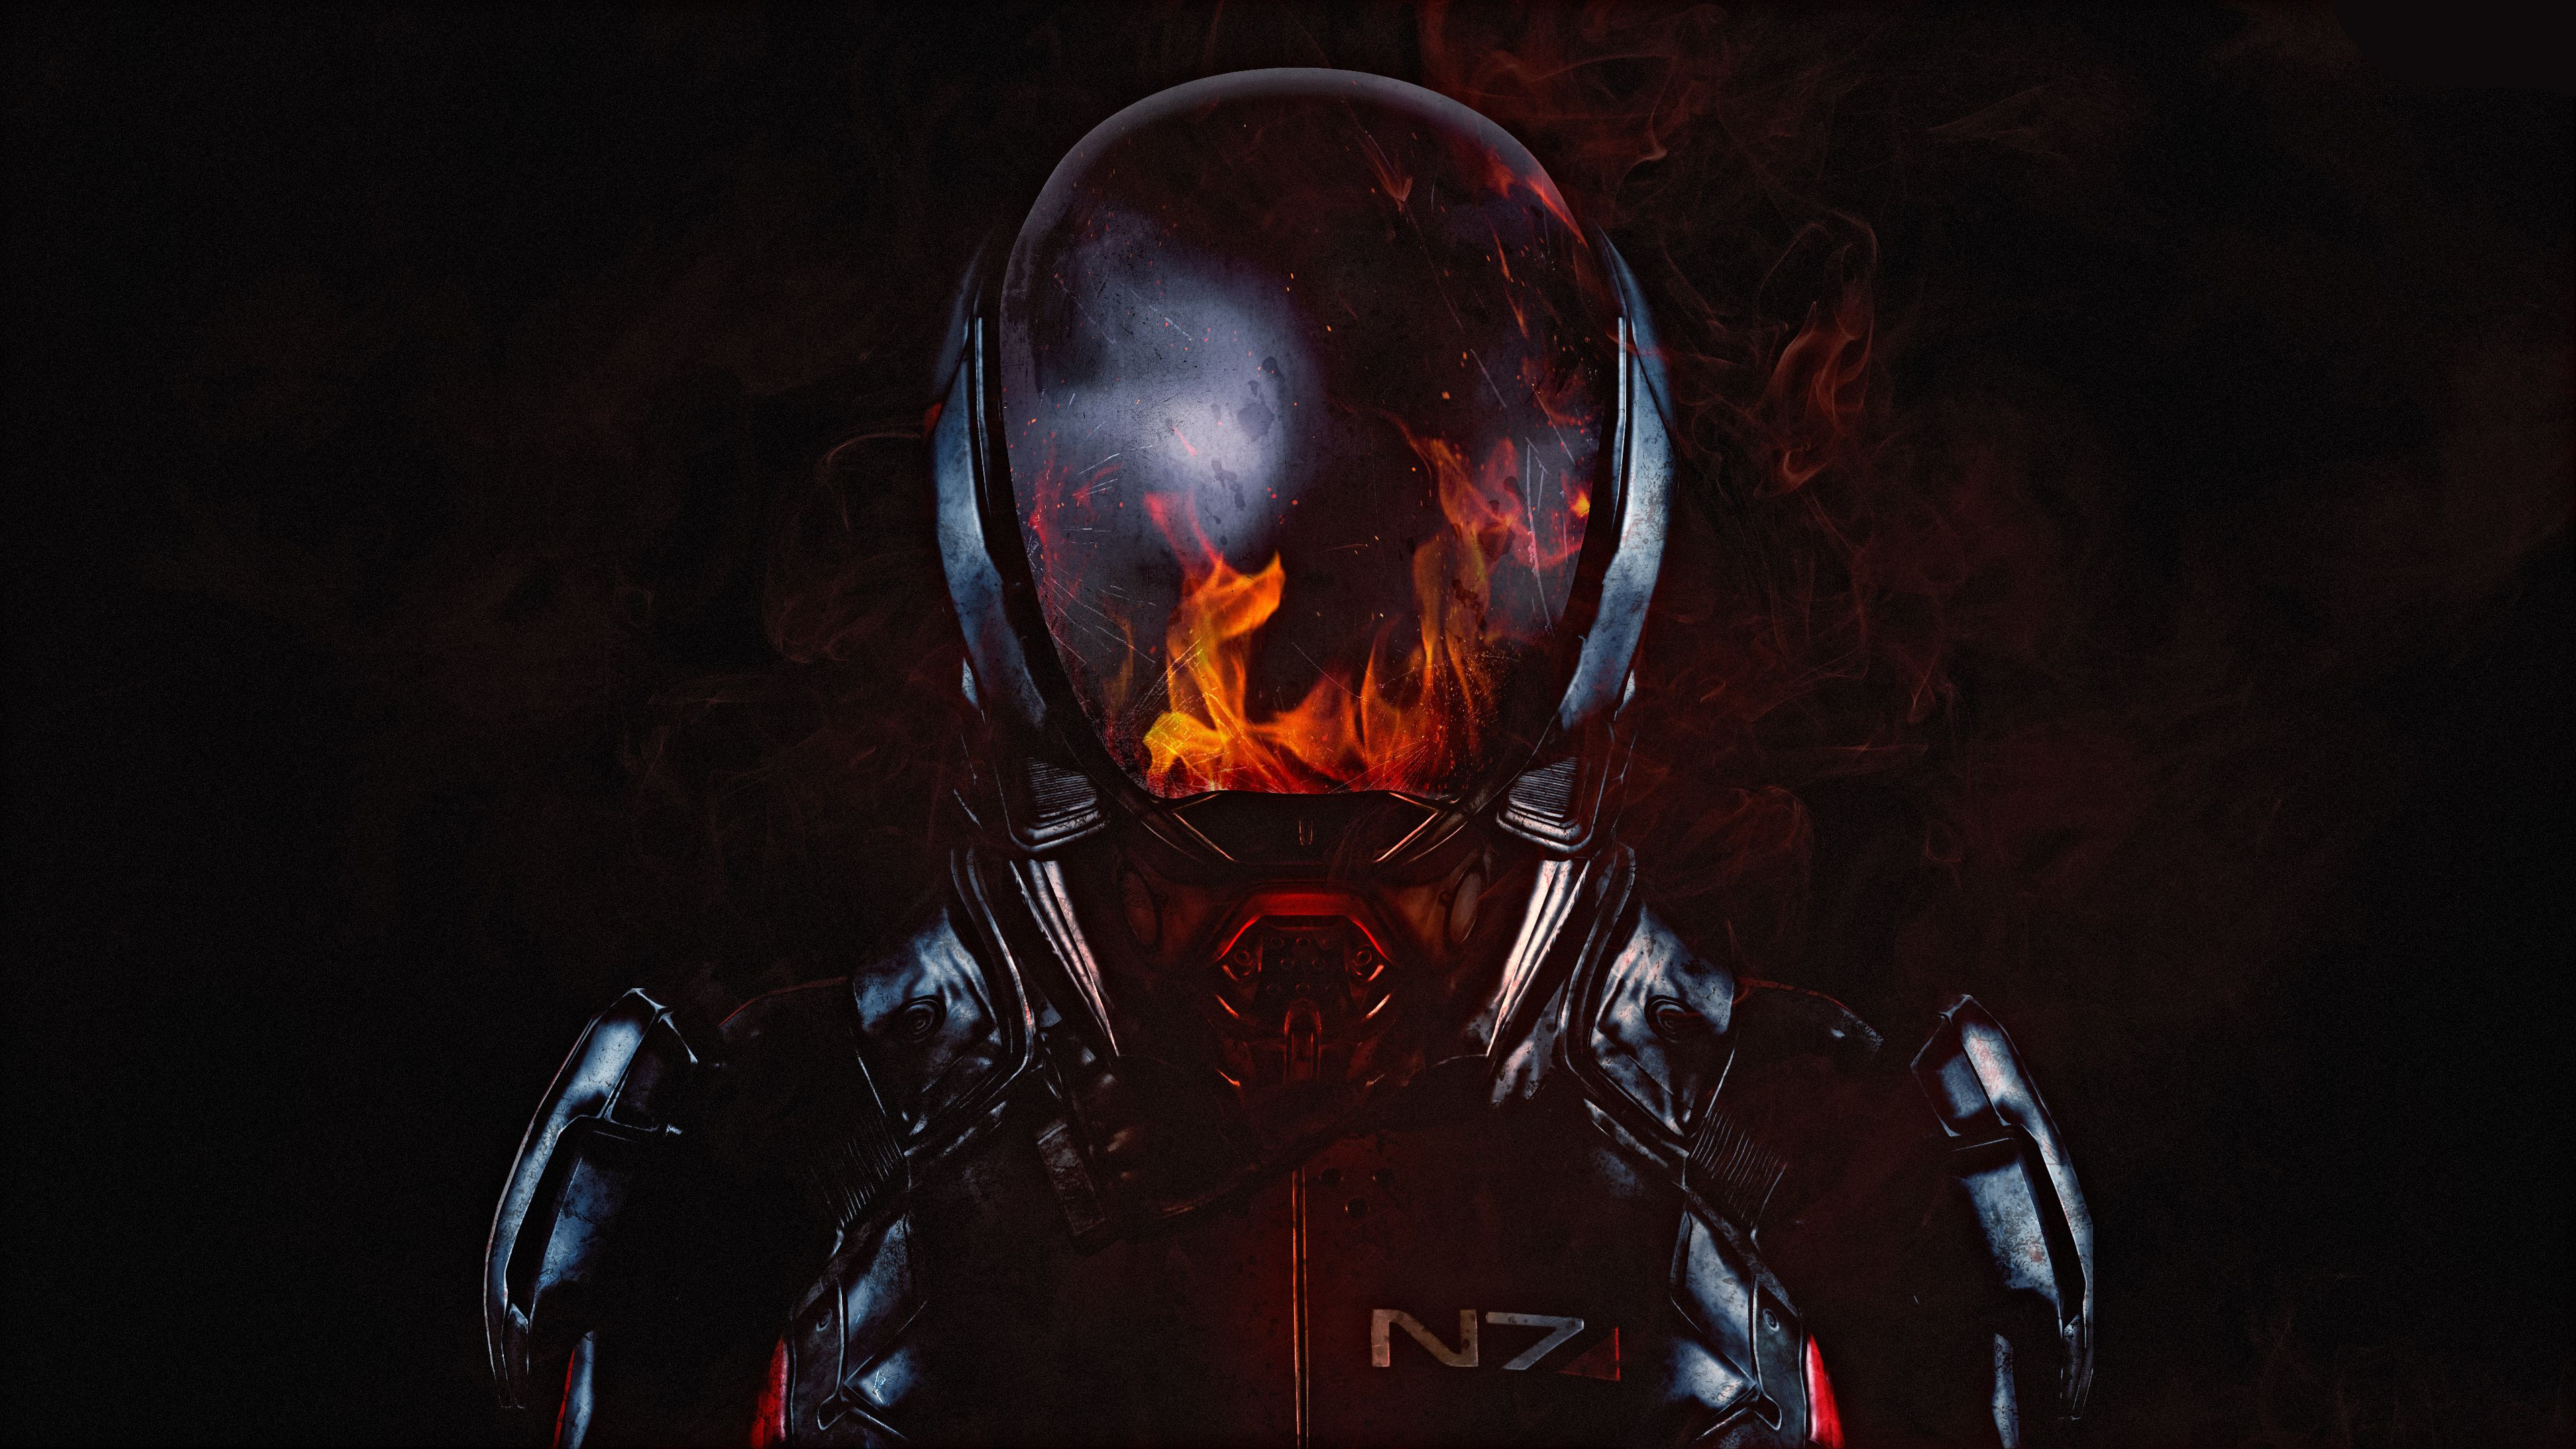 Fire Mass Effect Andromeda 4k Http Www Pixel4k Com Fire Mass Effect Andromeda 4k 7235 Html Andromeda Effect Exo Fire Ma Mass Effect Hd Wallpaper N7 Armor